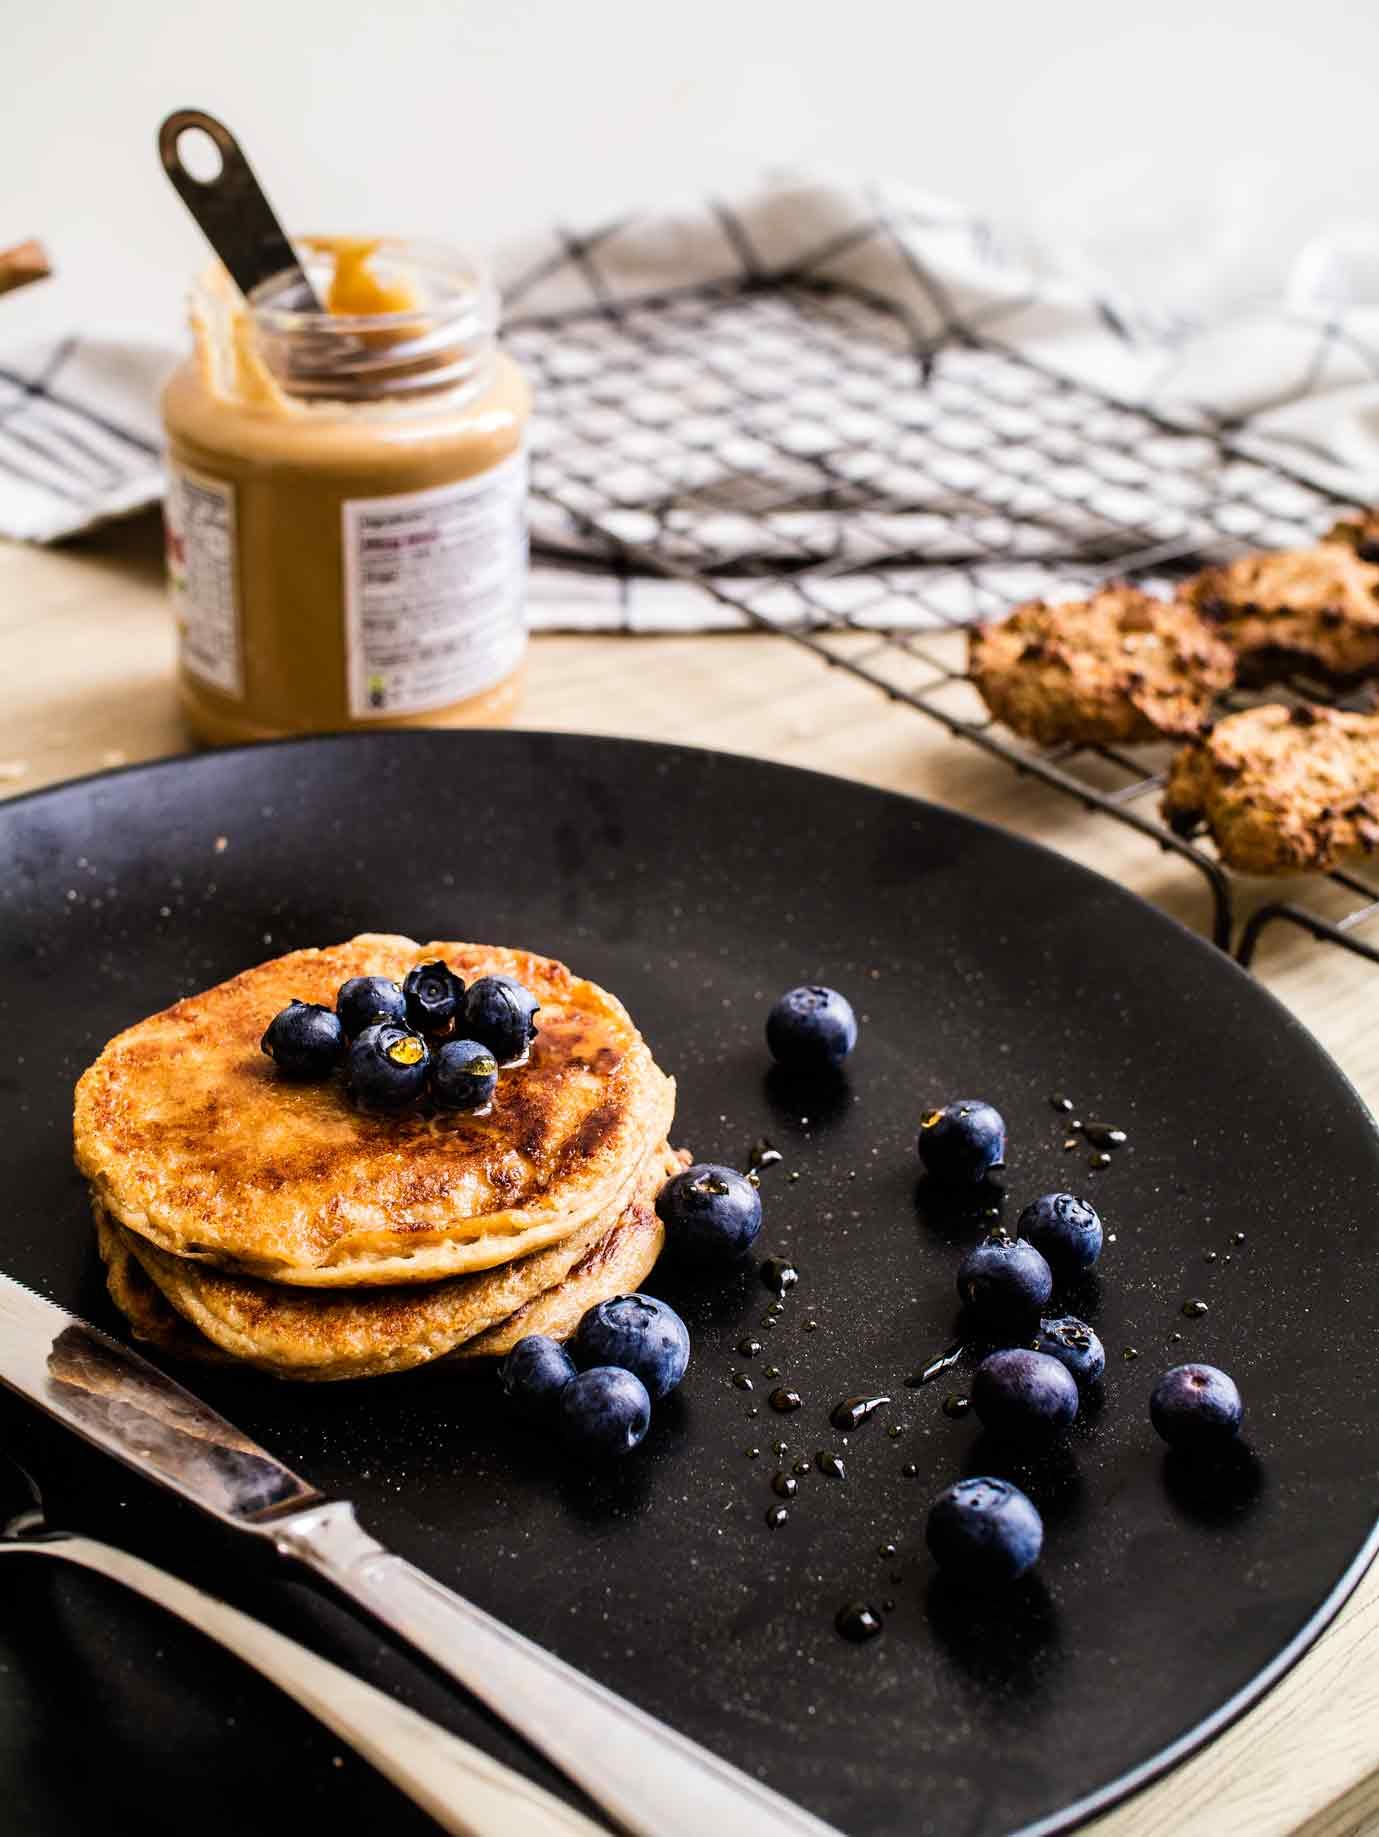 Peanut, oat, banana pancakes | 4 peanut butter recipes, 4 ingredients each! | www.discoverdelicious.org | vegan food blog